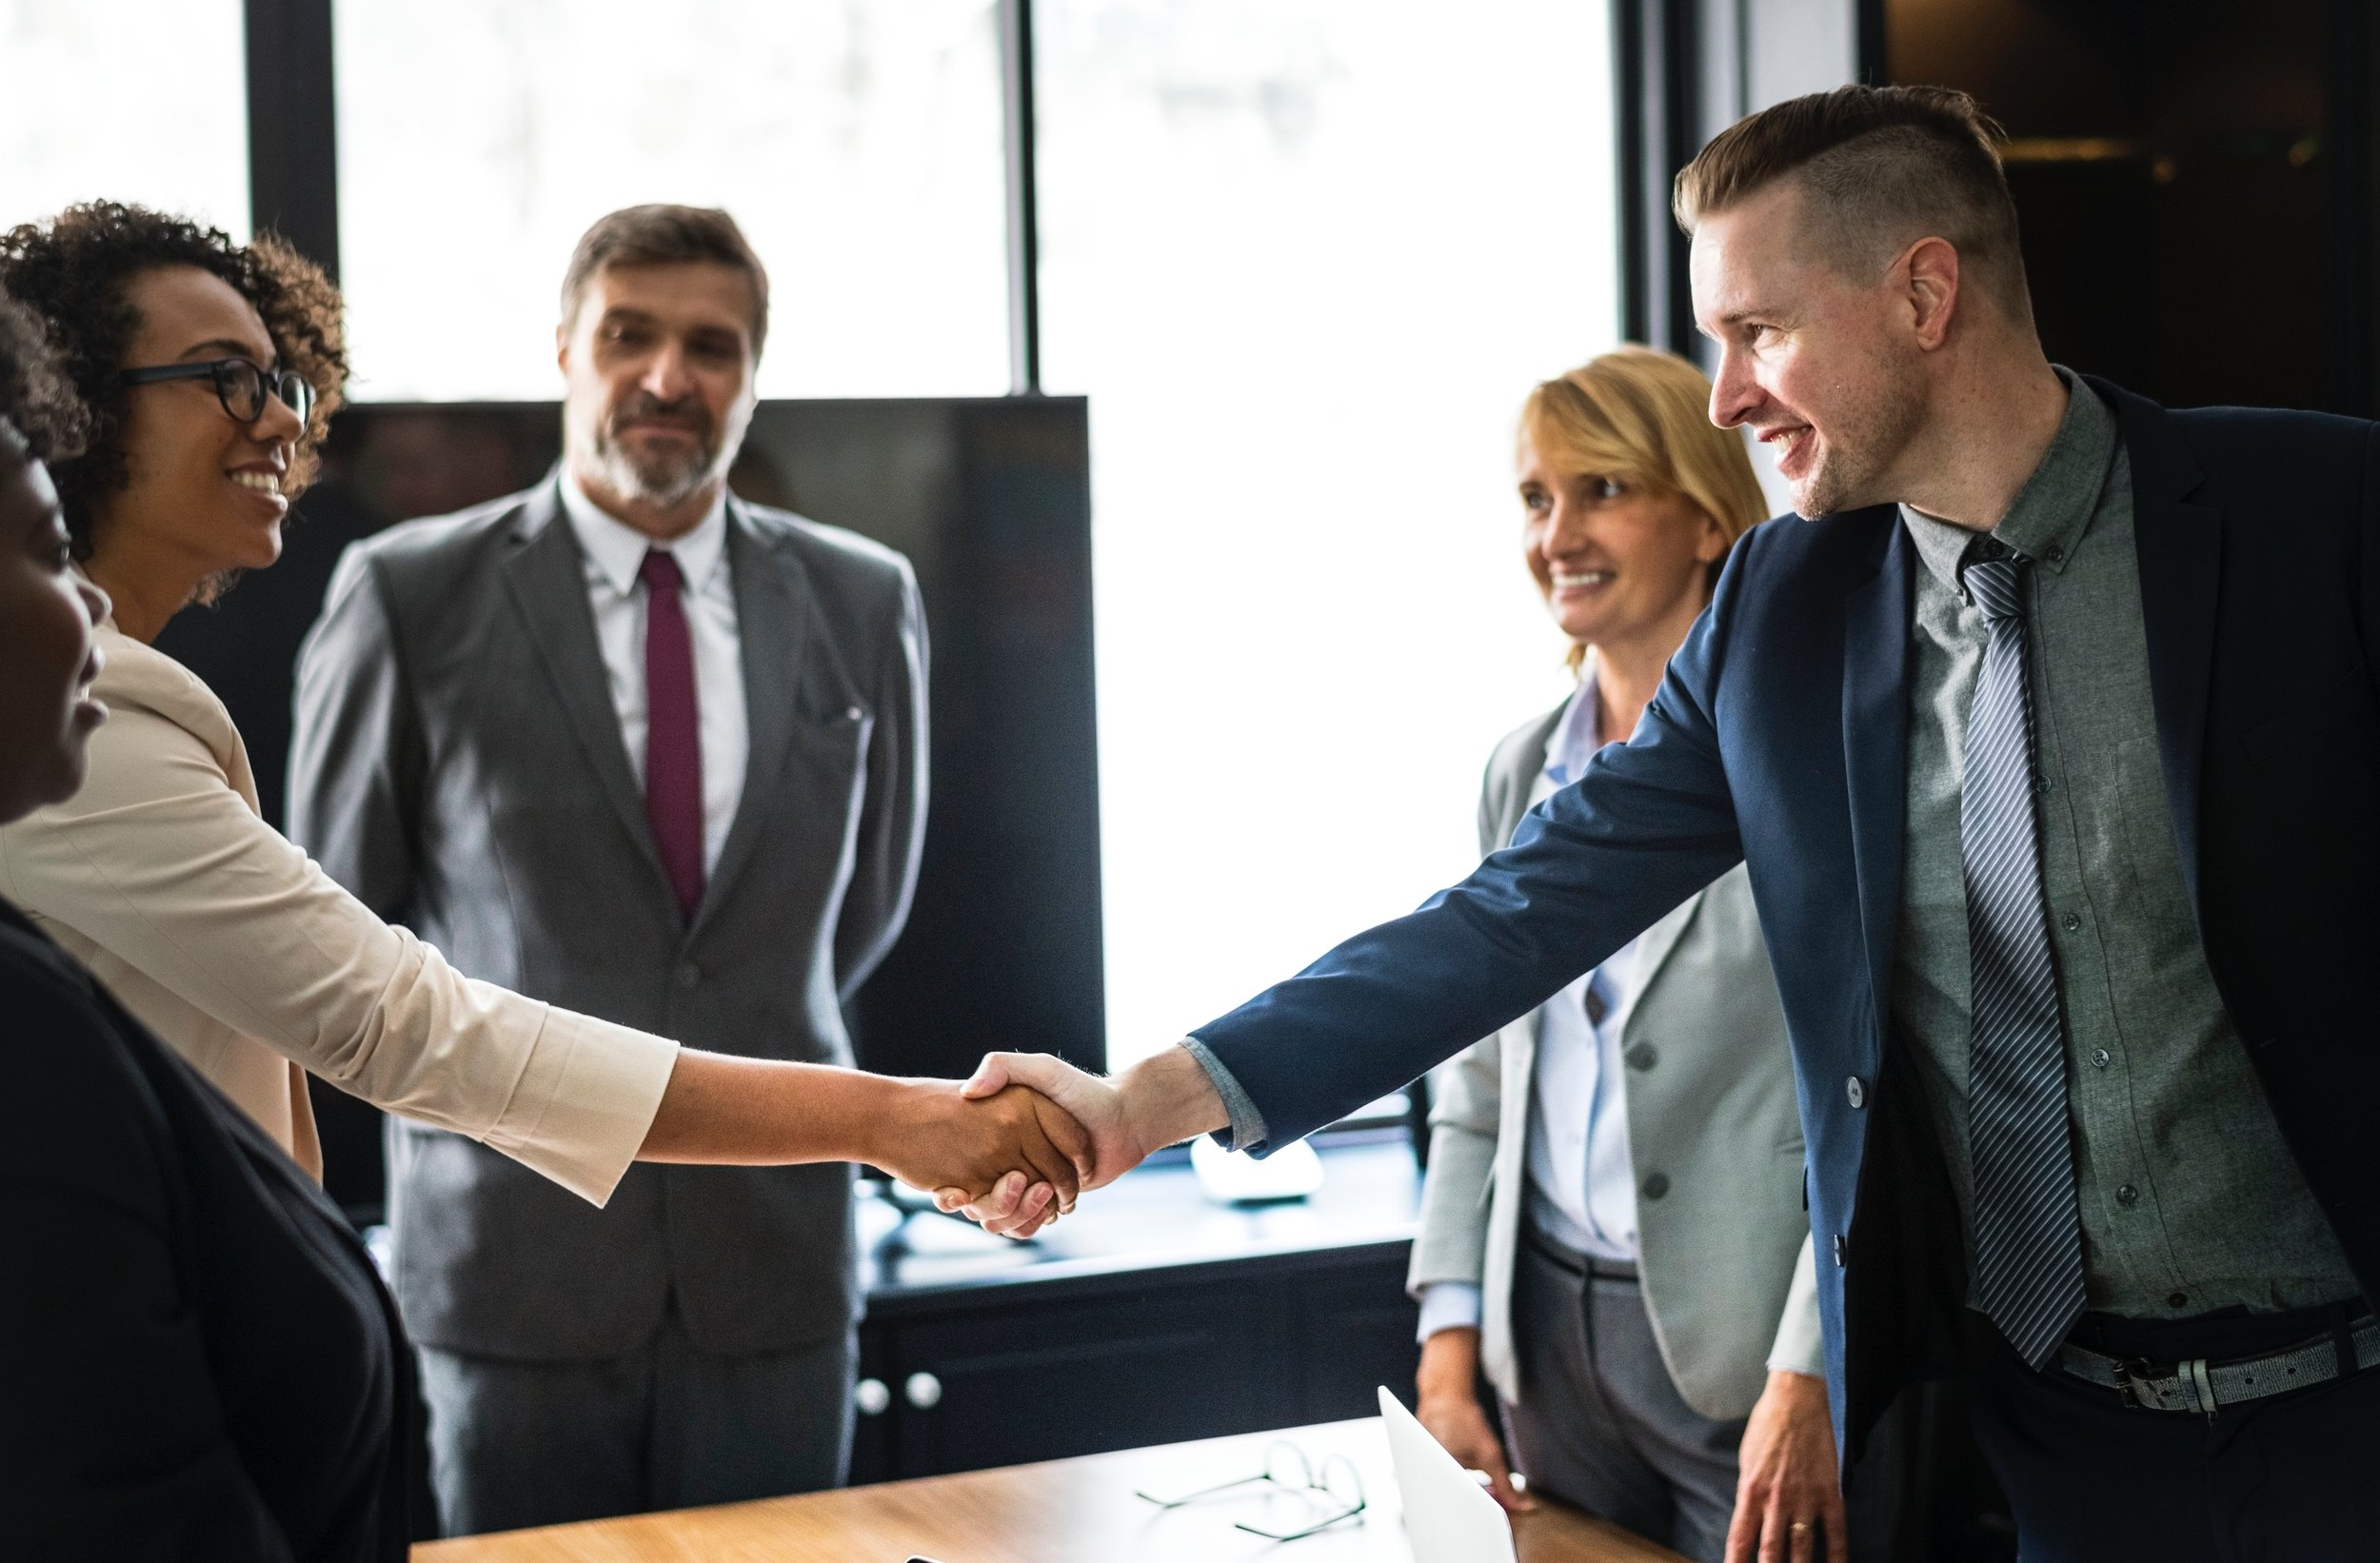 accomplishment-agreement-business-1249158 (1).jpg